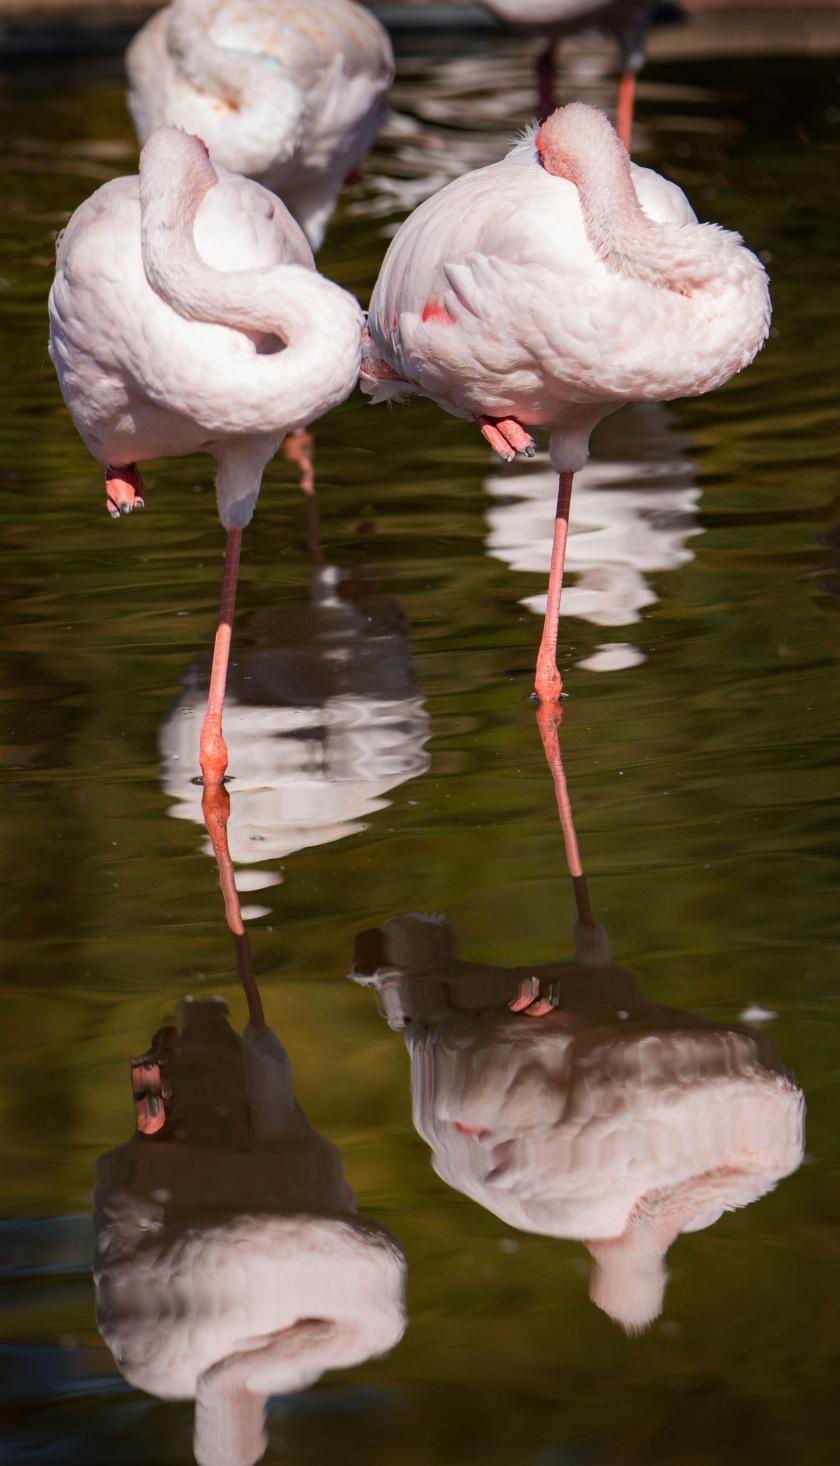 #sleeping, #rainydays, #mondays, #tired, #reflection, #flamingo, #sandiego, #safaripark